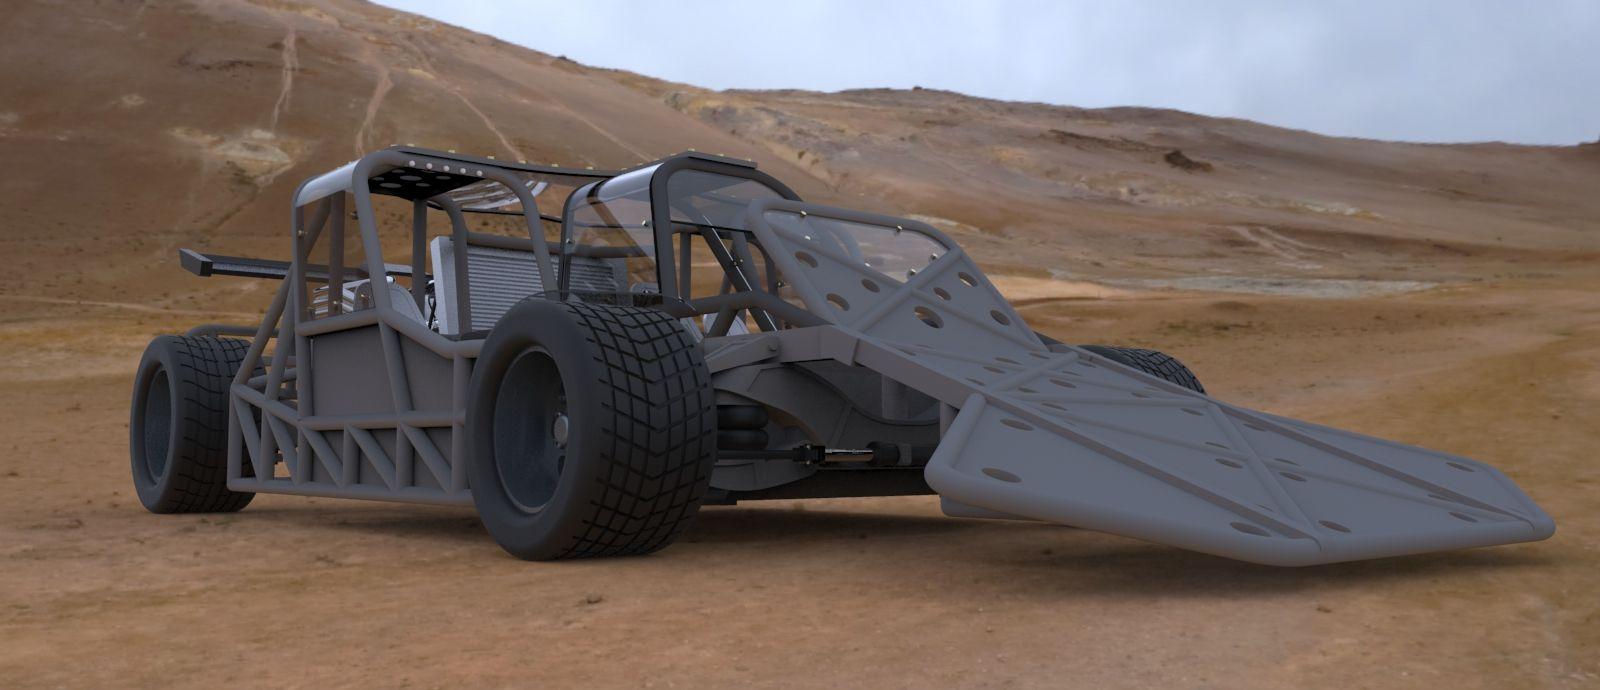 Ramp-car-37-3500-3500